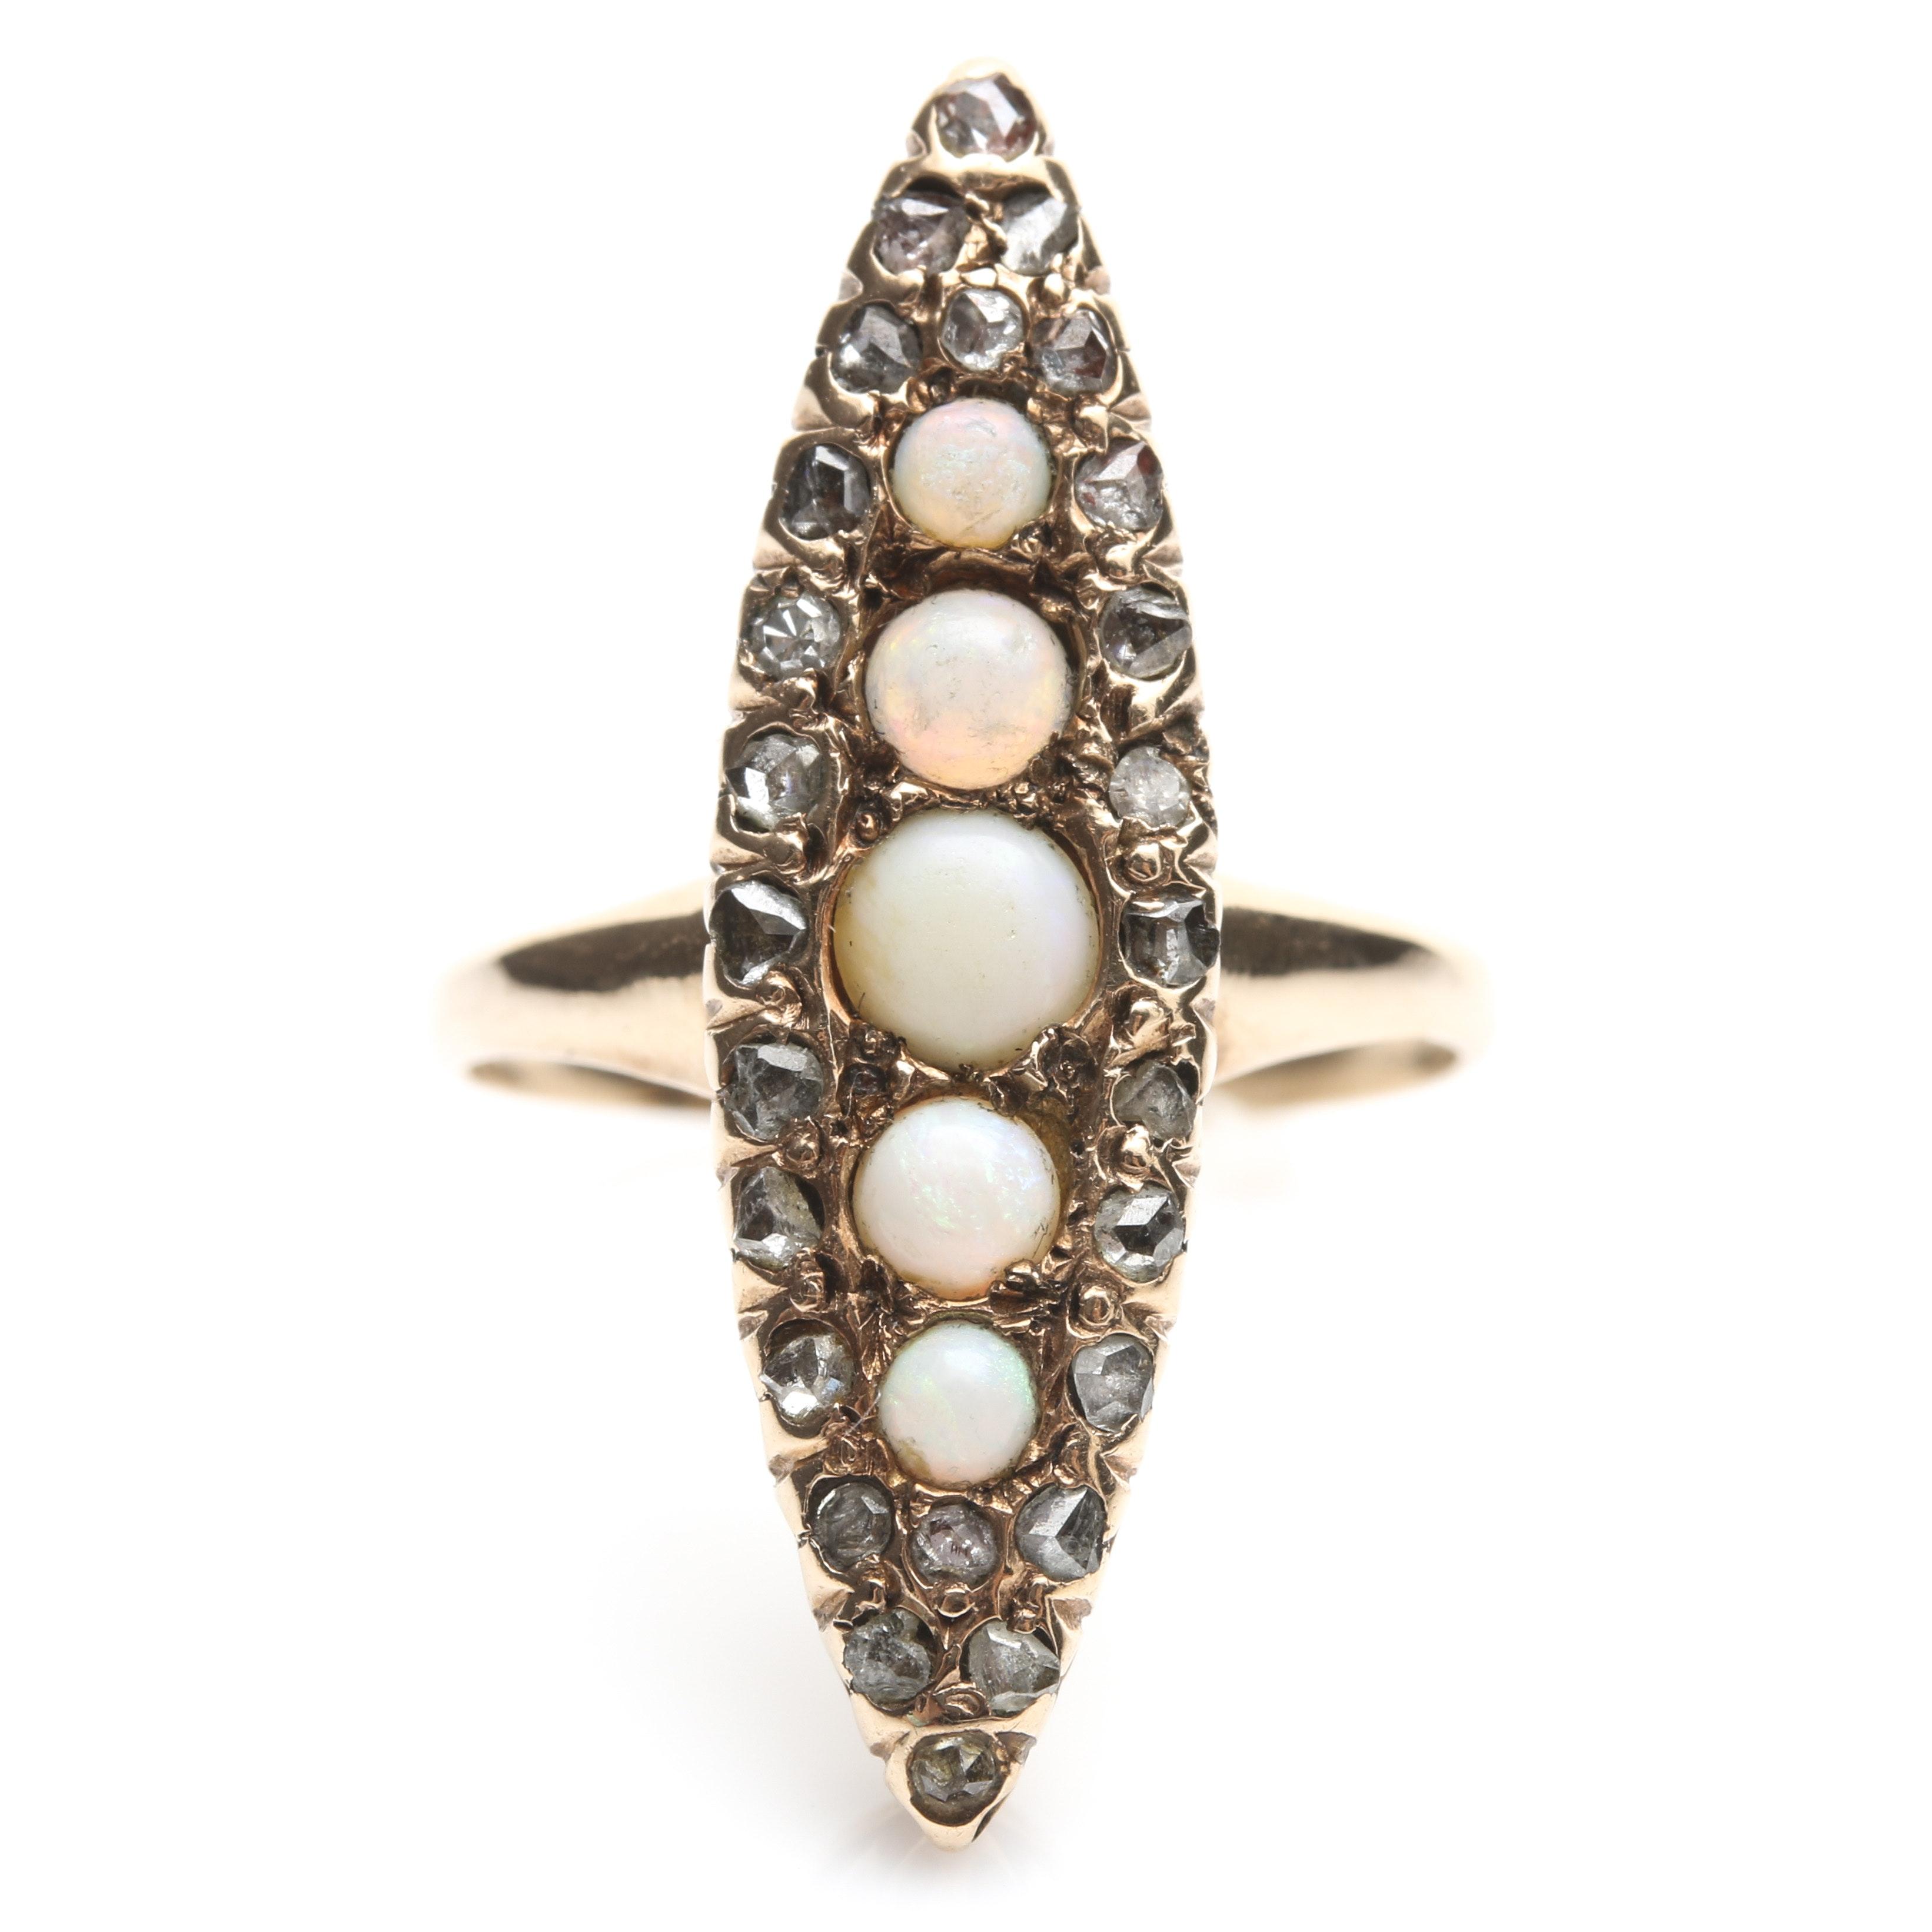 10K Yellow Gold Opal and Mine Cut Diamond Ring